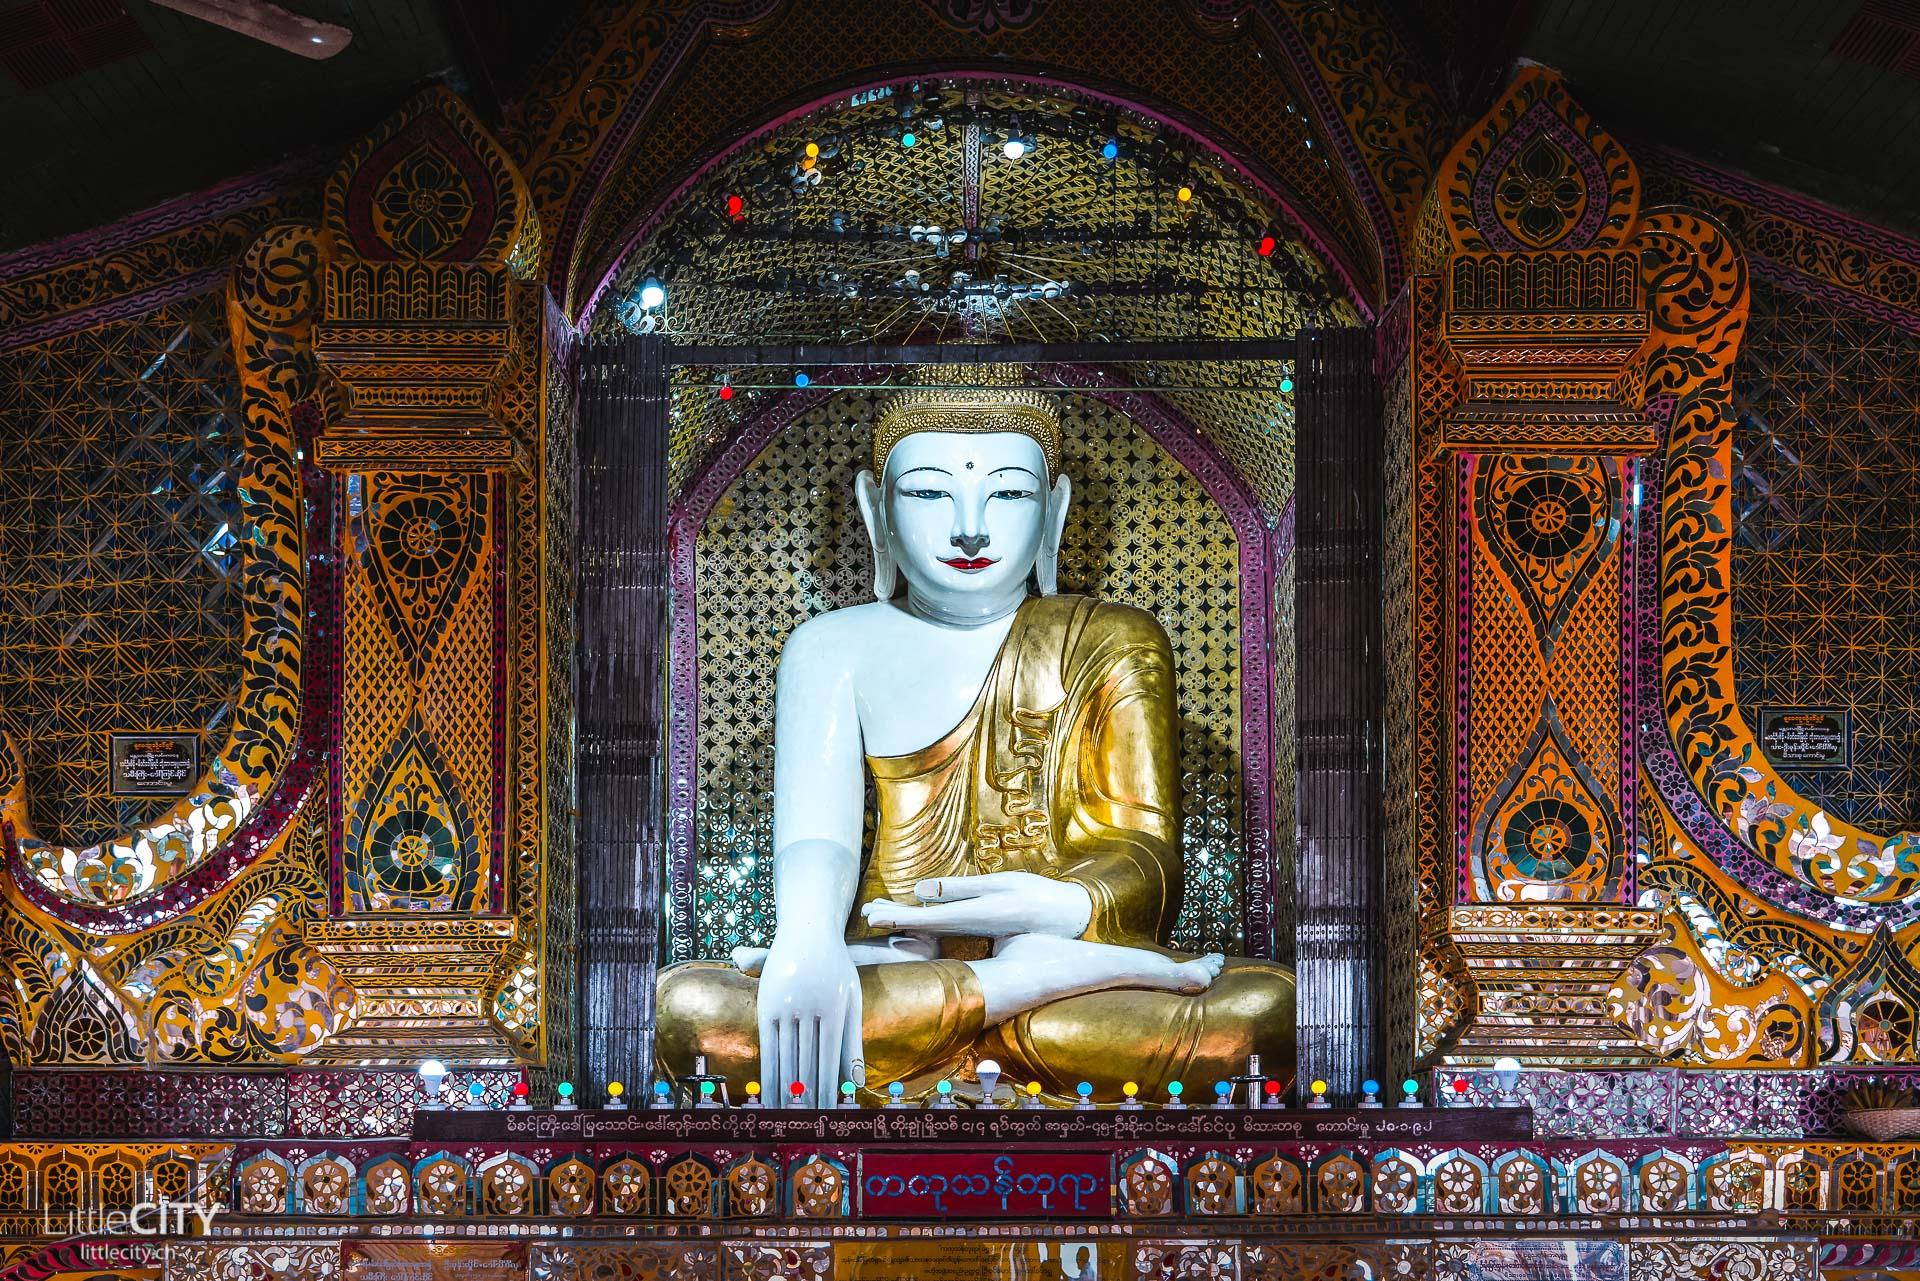 Mandalay Hill Mandakay Sehenswürdigkeiten Buddha